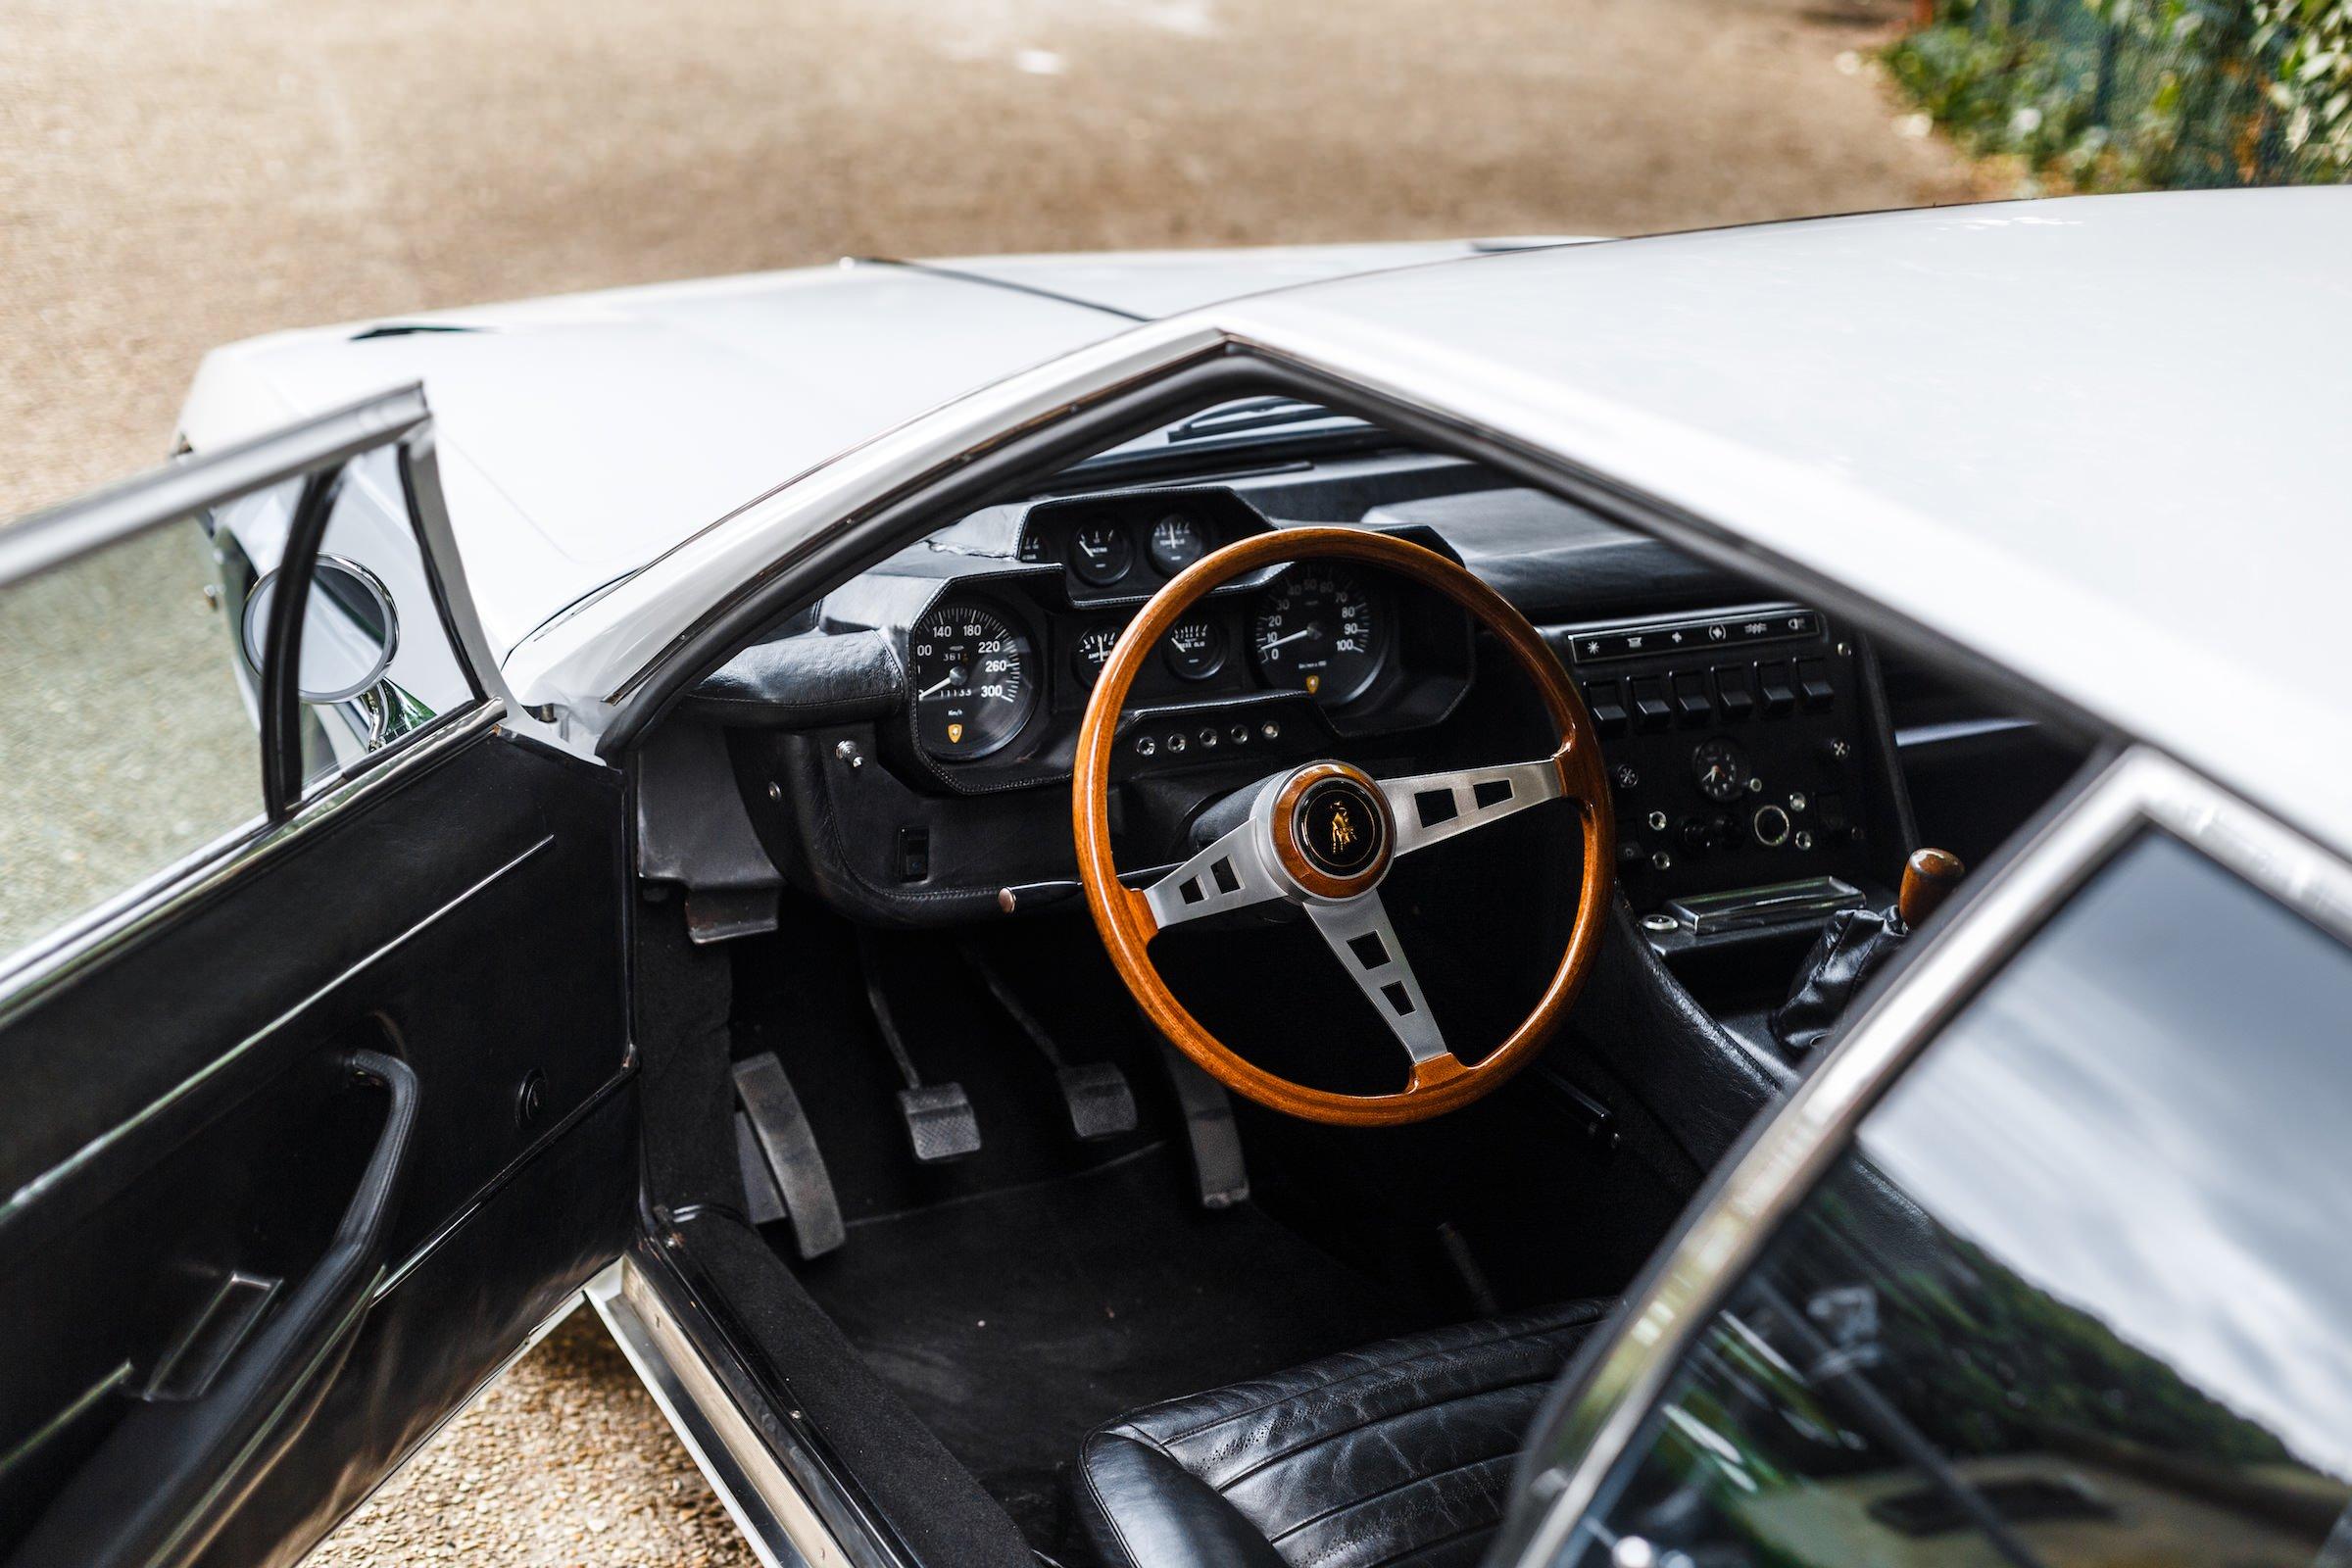 https://silodrome.com/wp-content/uploads/2017/10/Lamborghini-Espada-17.jpeg